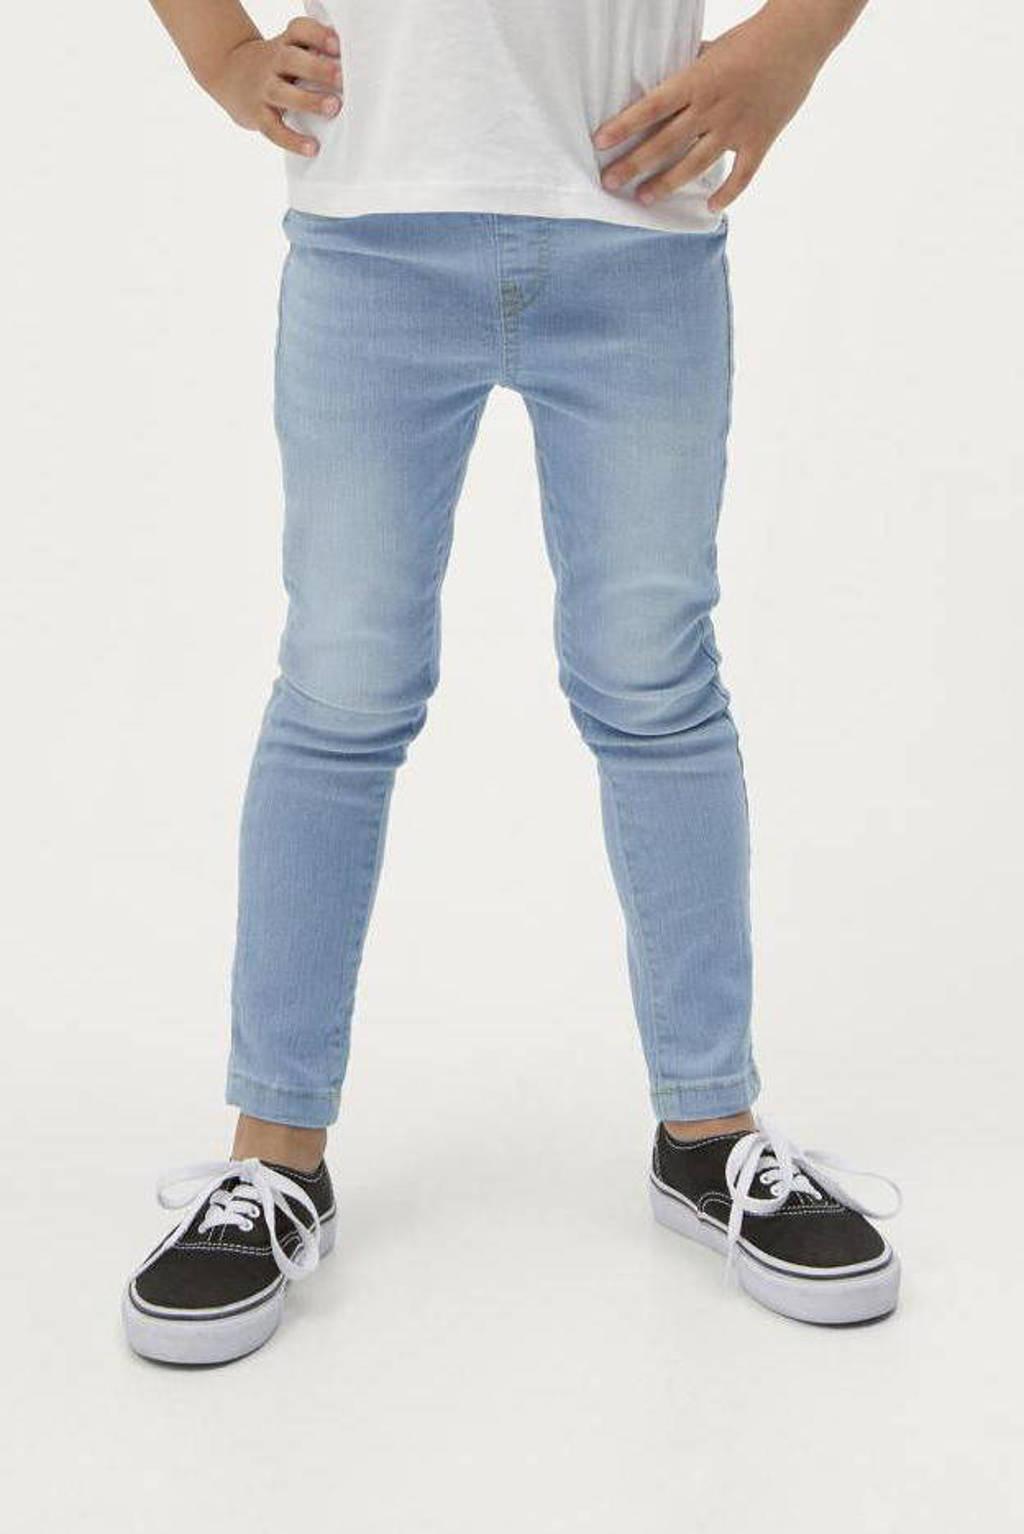 Ellos skinny jeans Freja blue